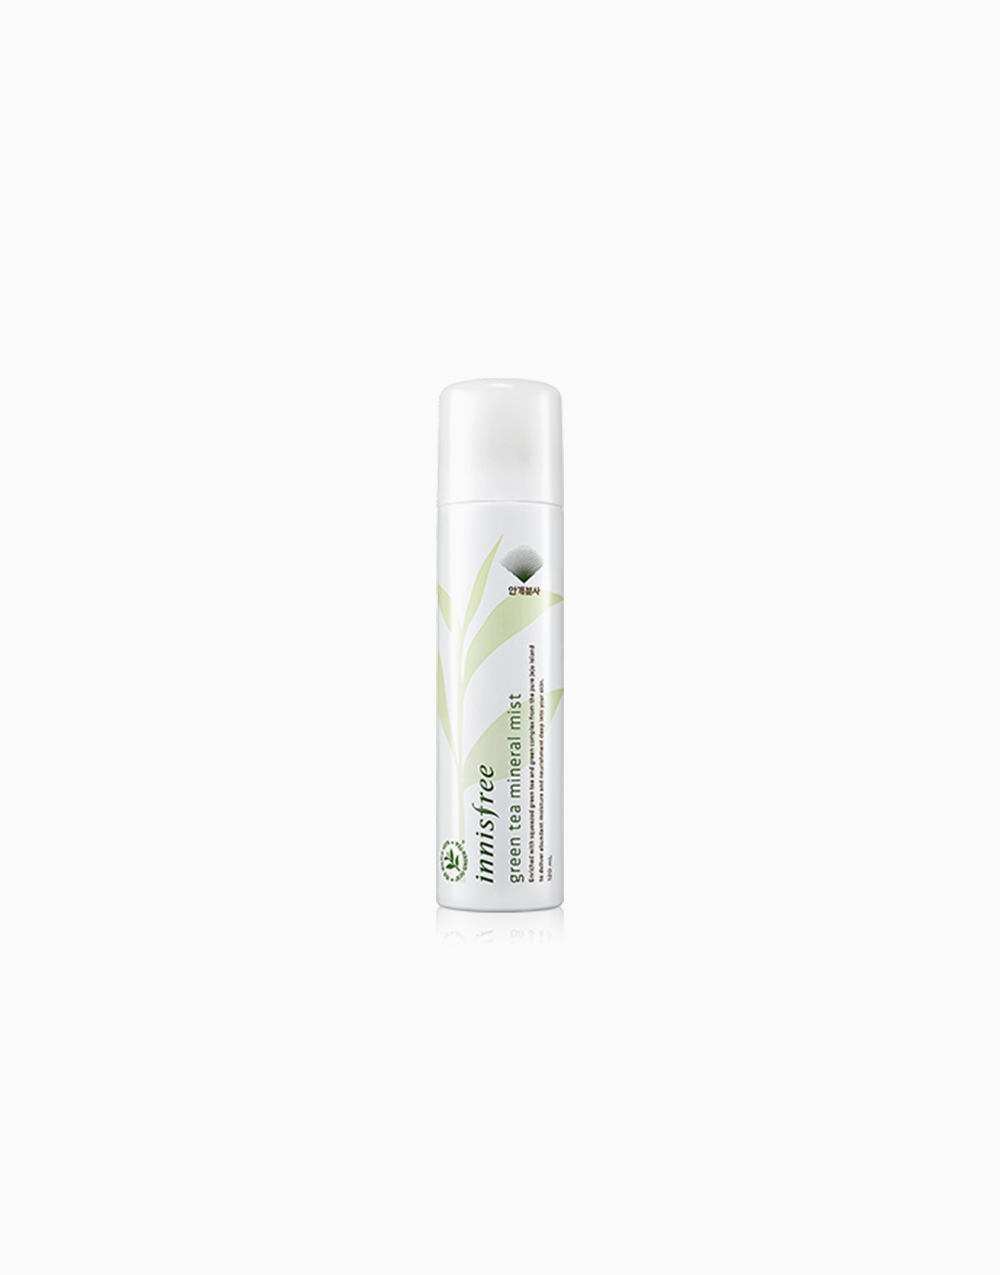 Green Tea Mist Micro (120ml) by Innisfree